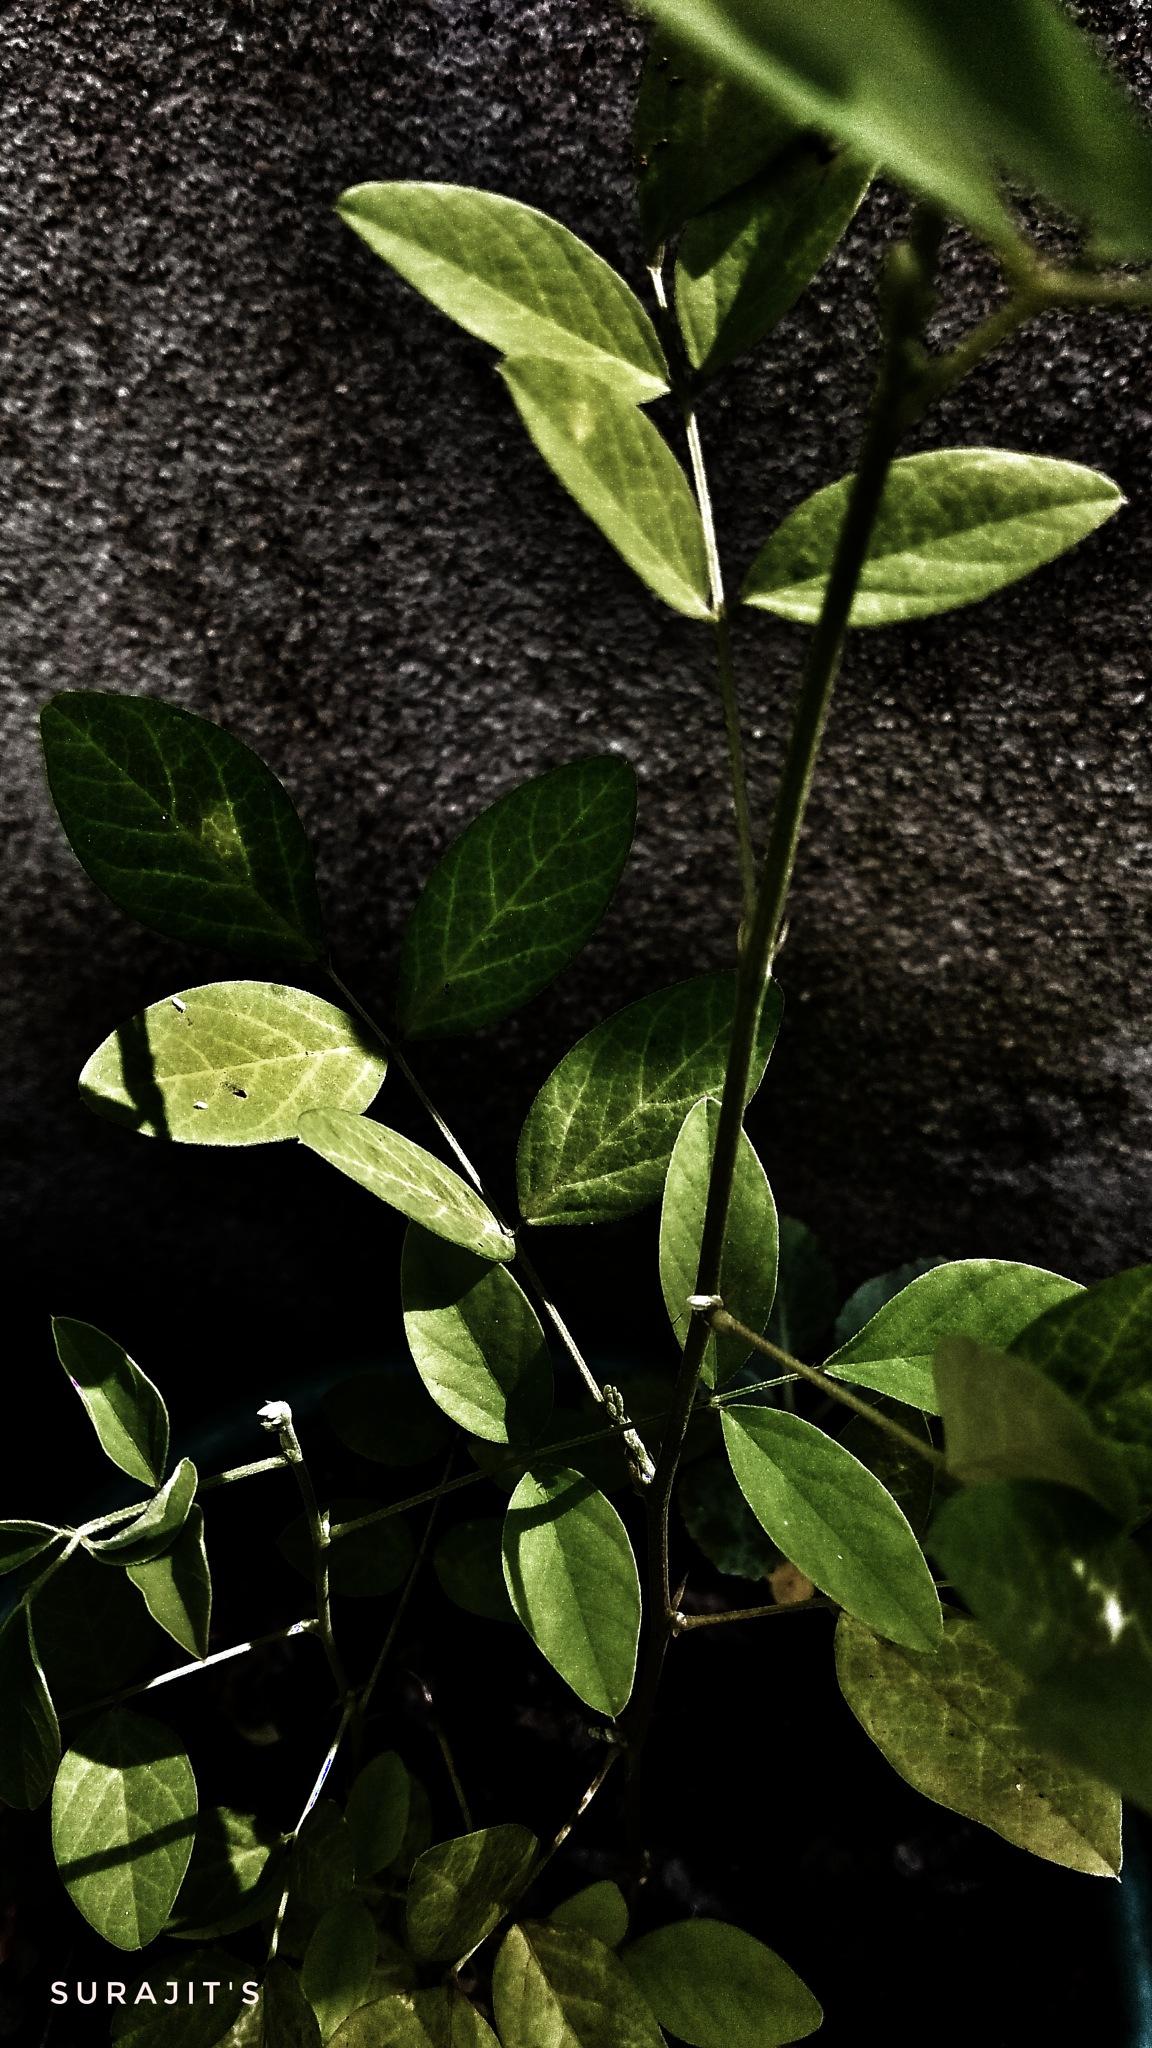 green leaves. by Surajit Bhattacharjee